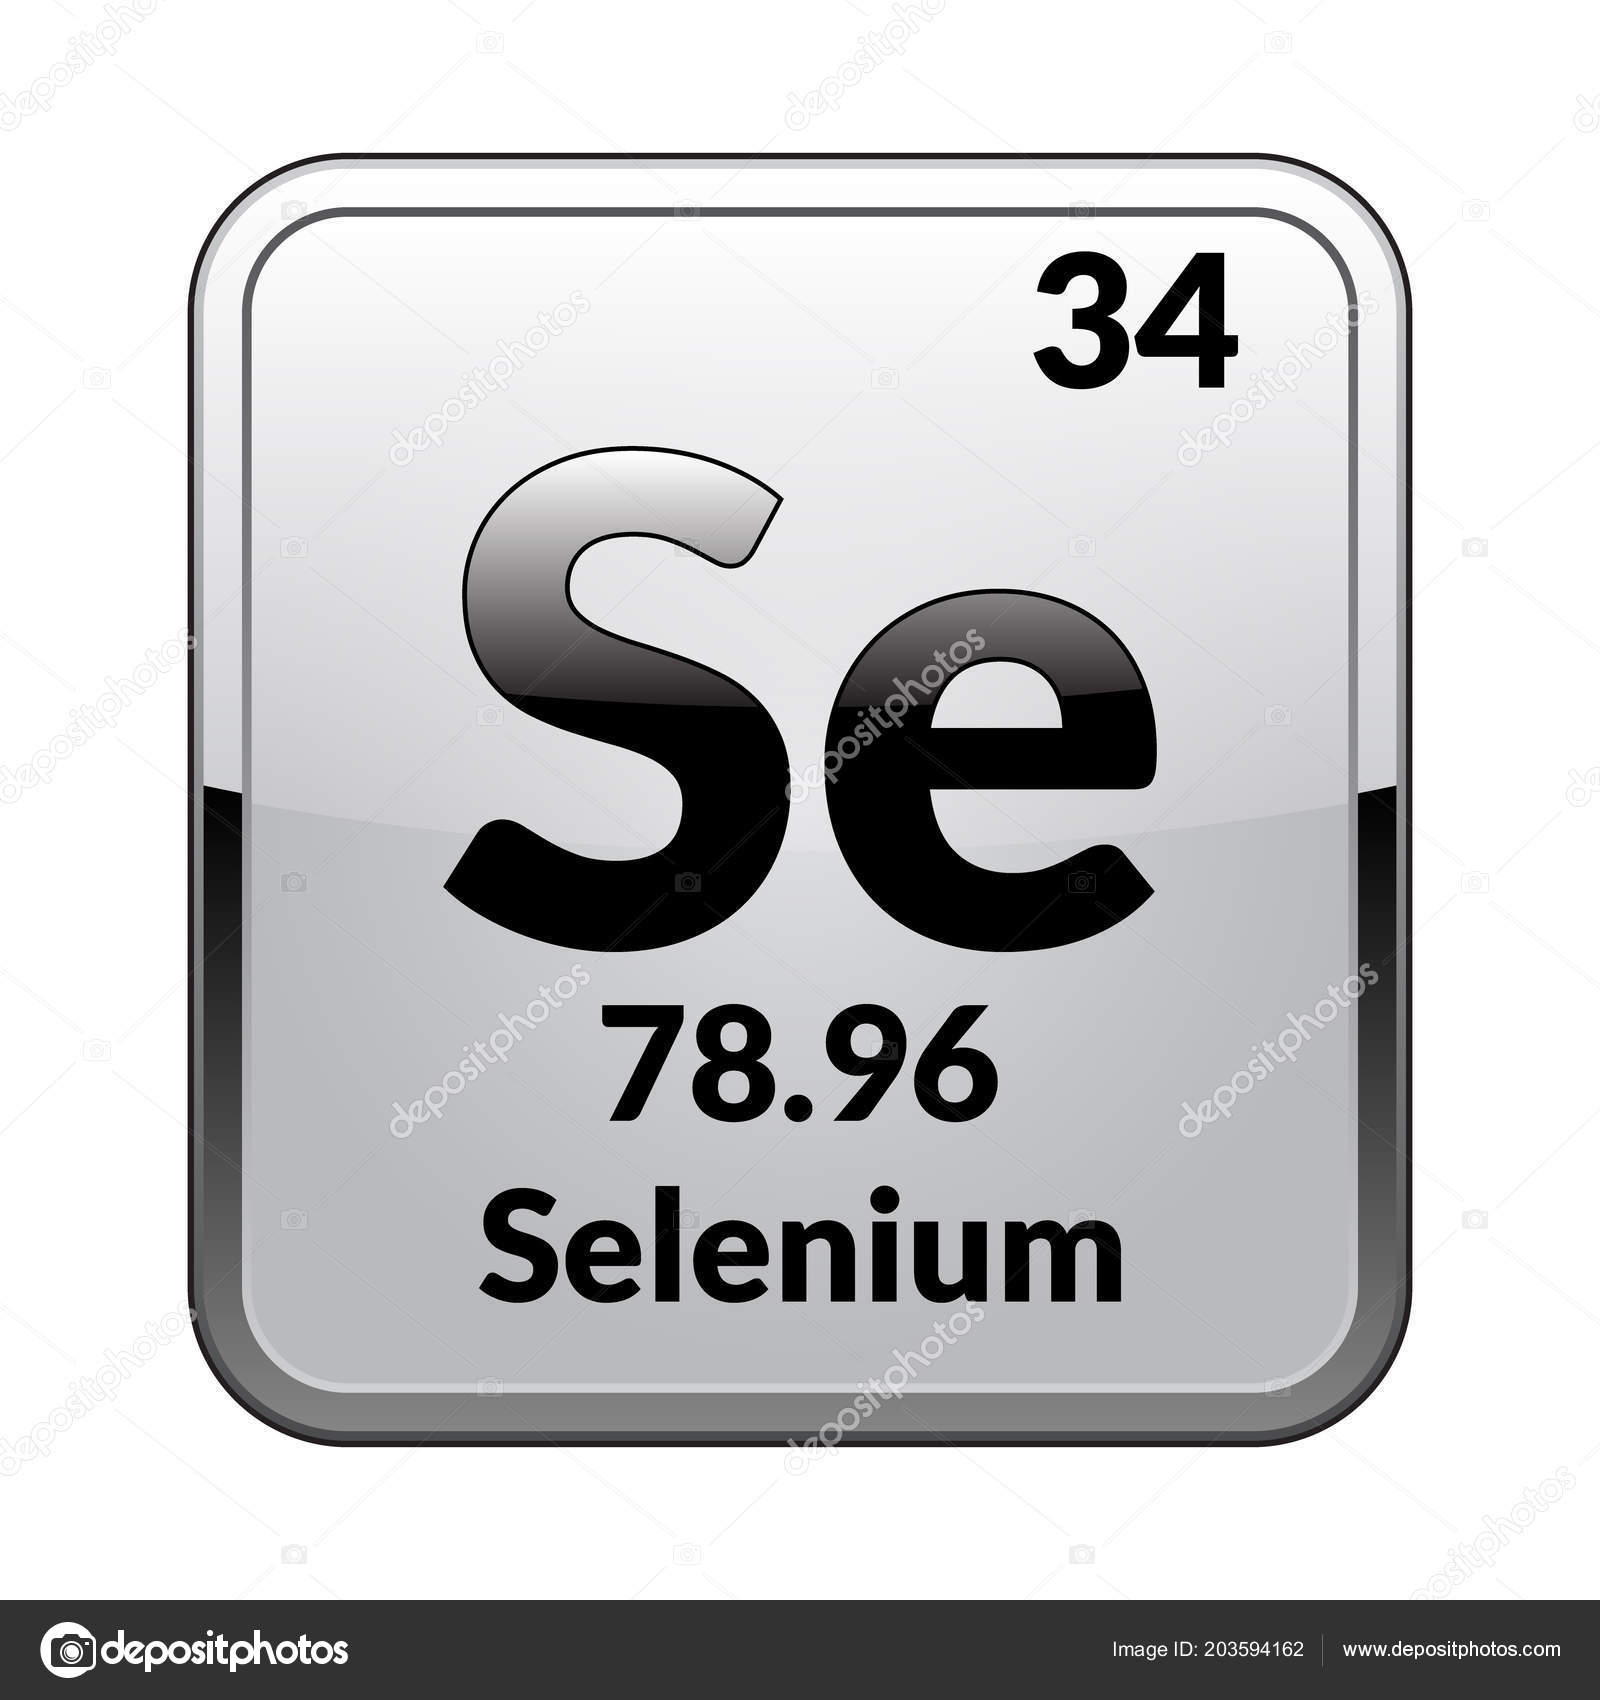 Selenium Symbol Chemical Element Periodic Table Glossy White